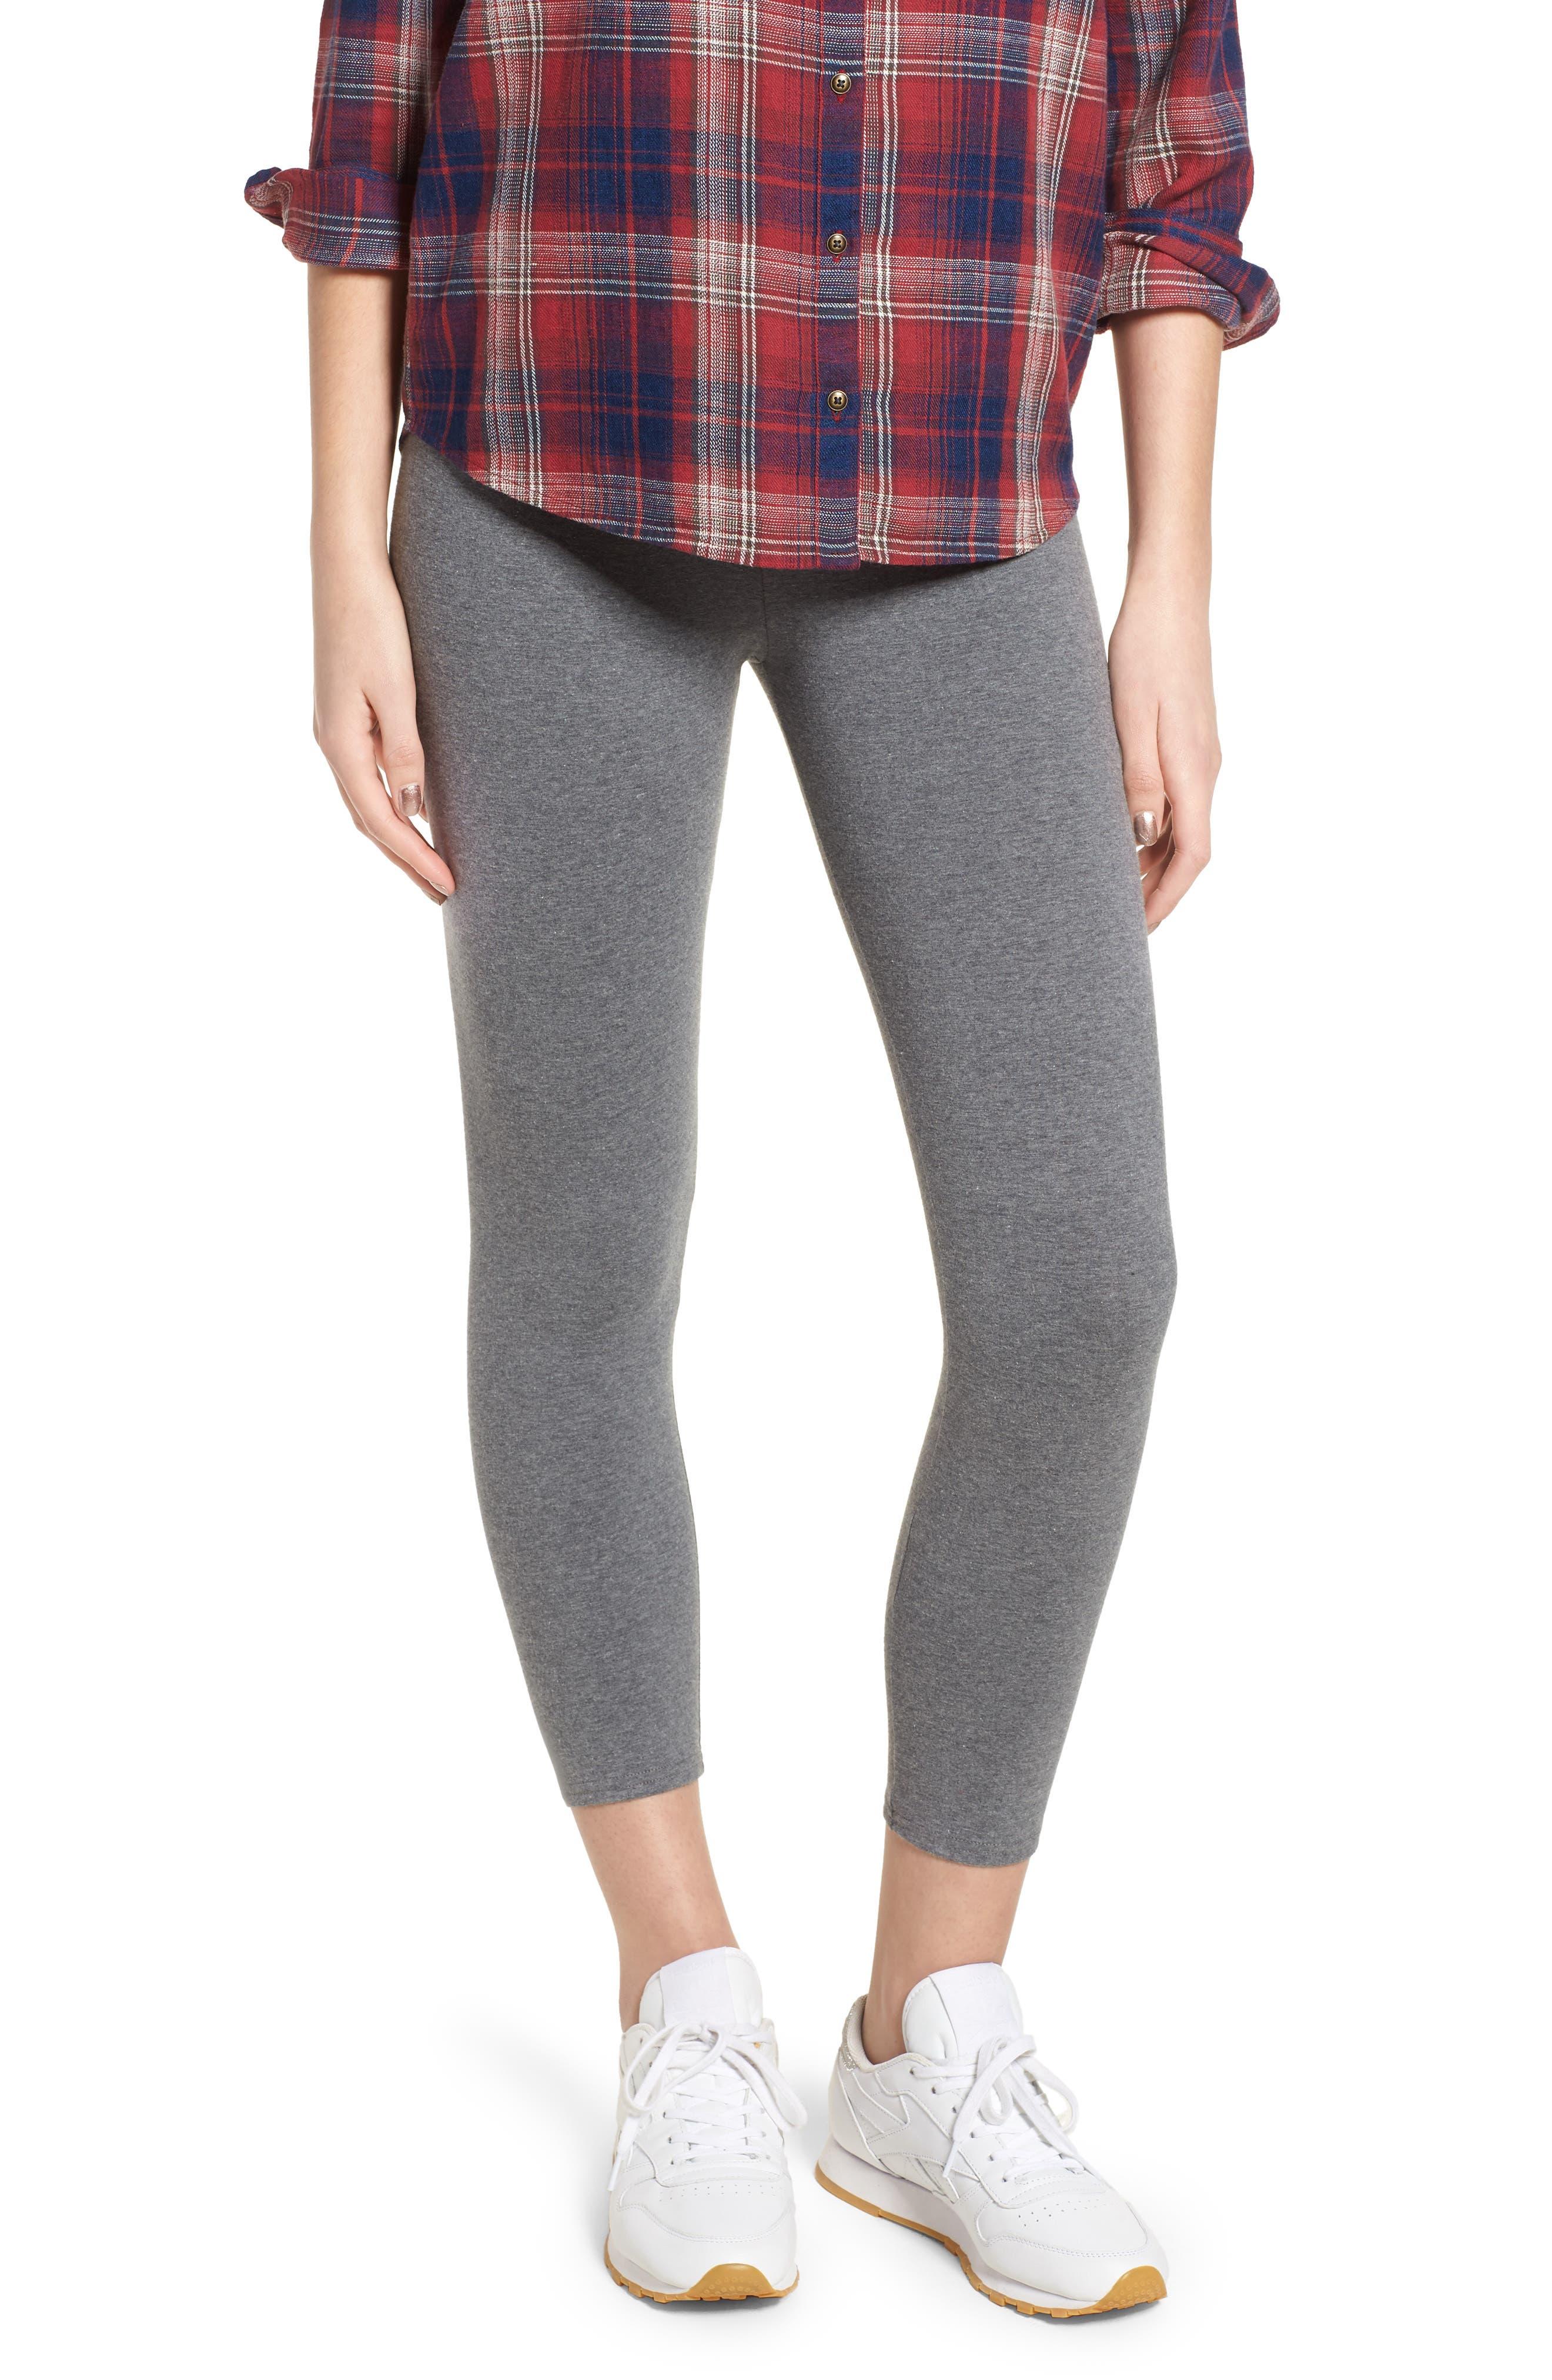 Nordstrom High Waist Crop Leggings, Grey